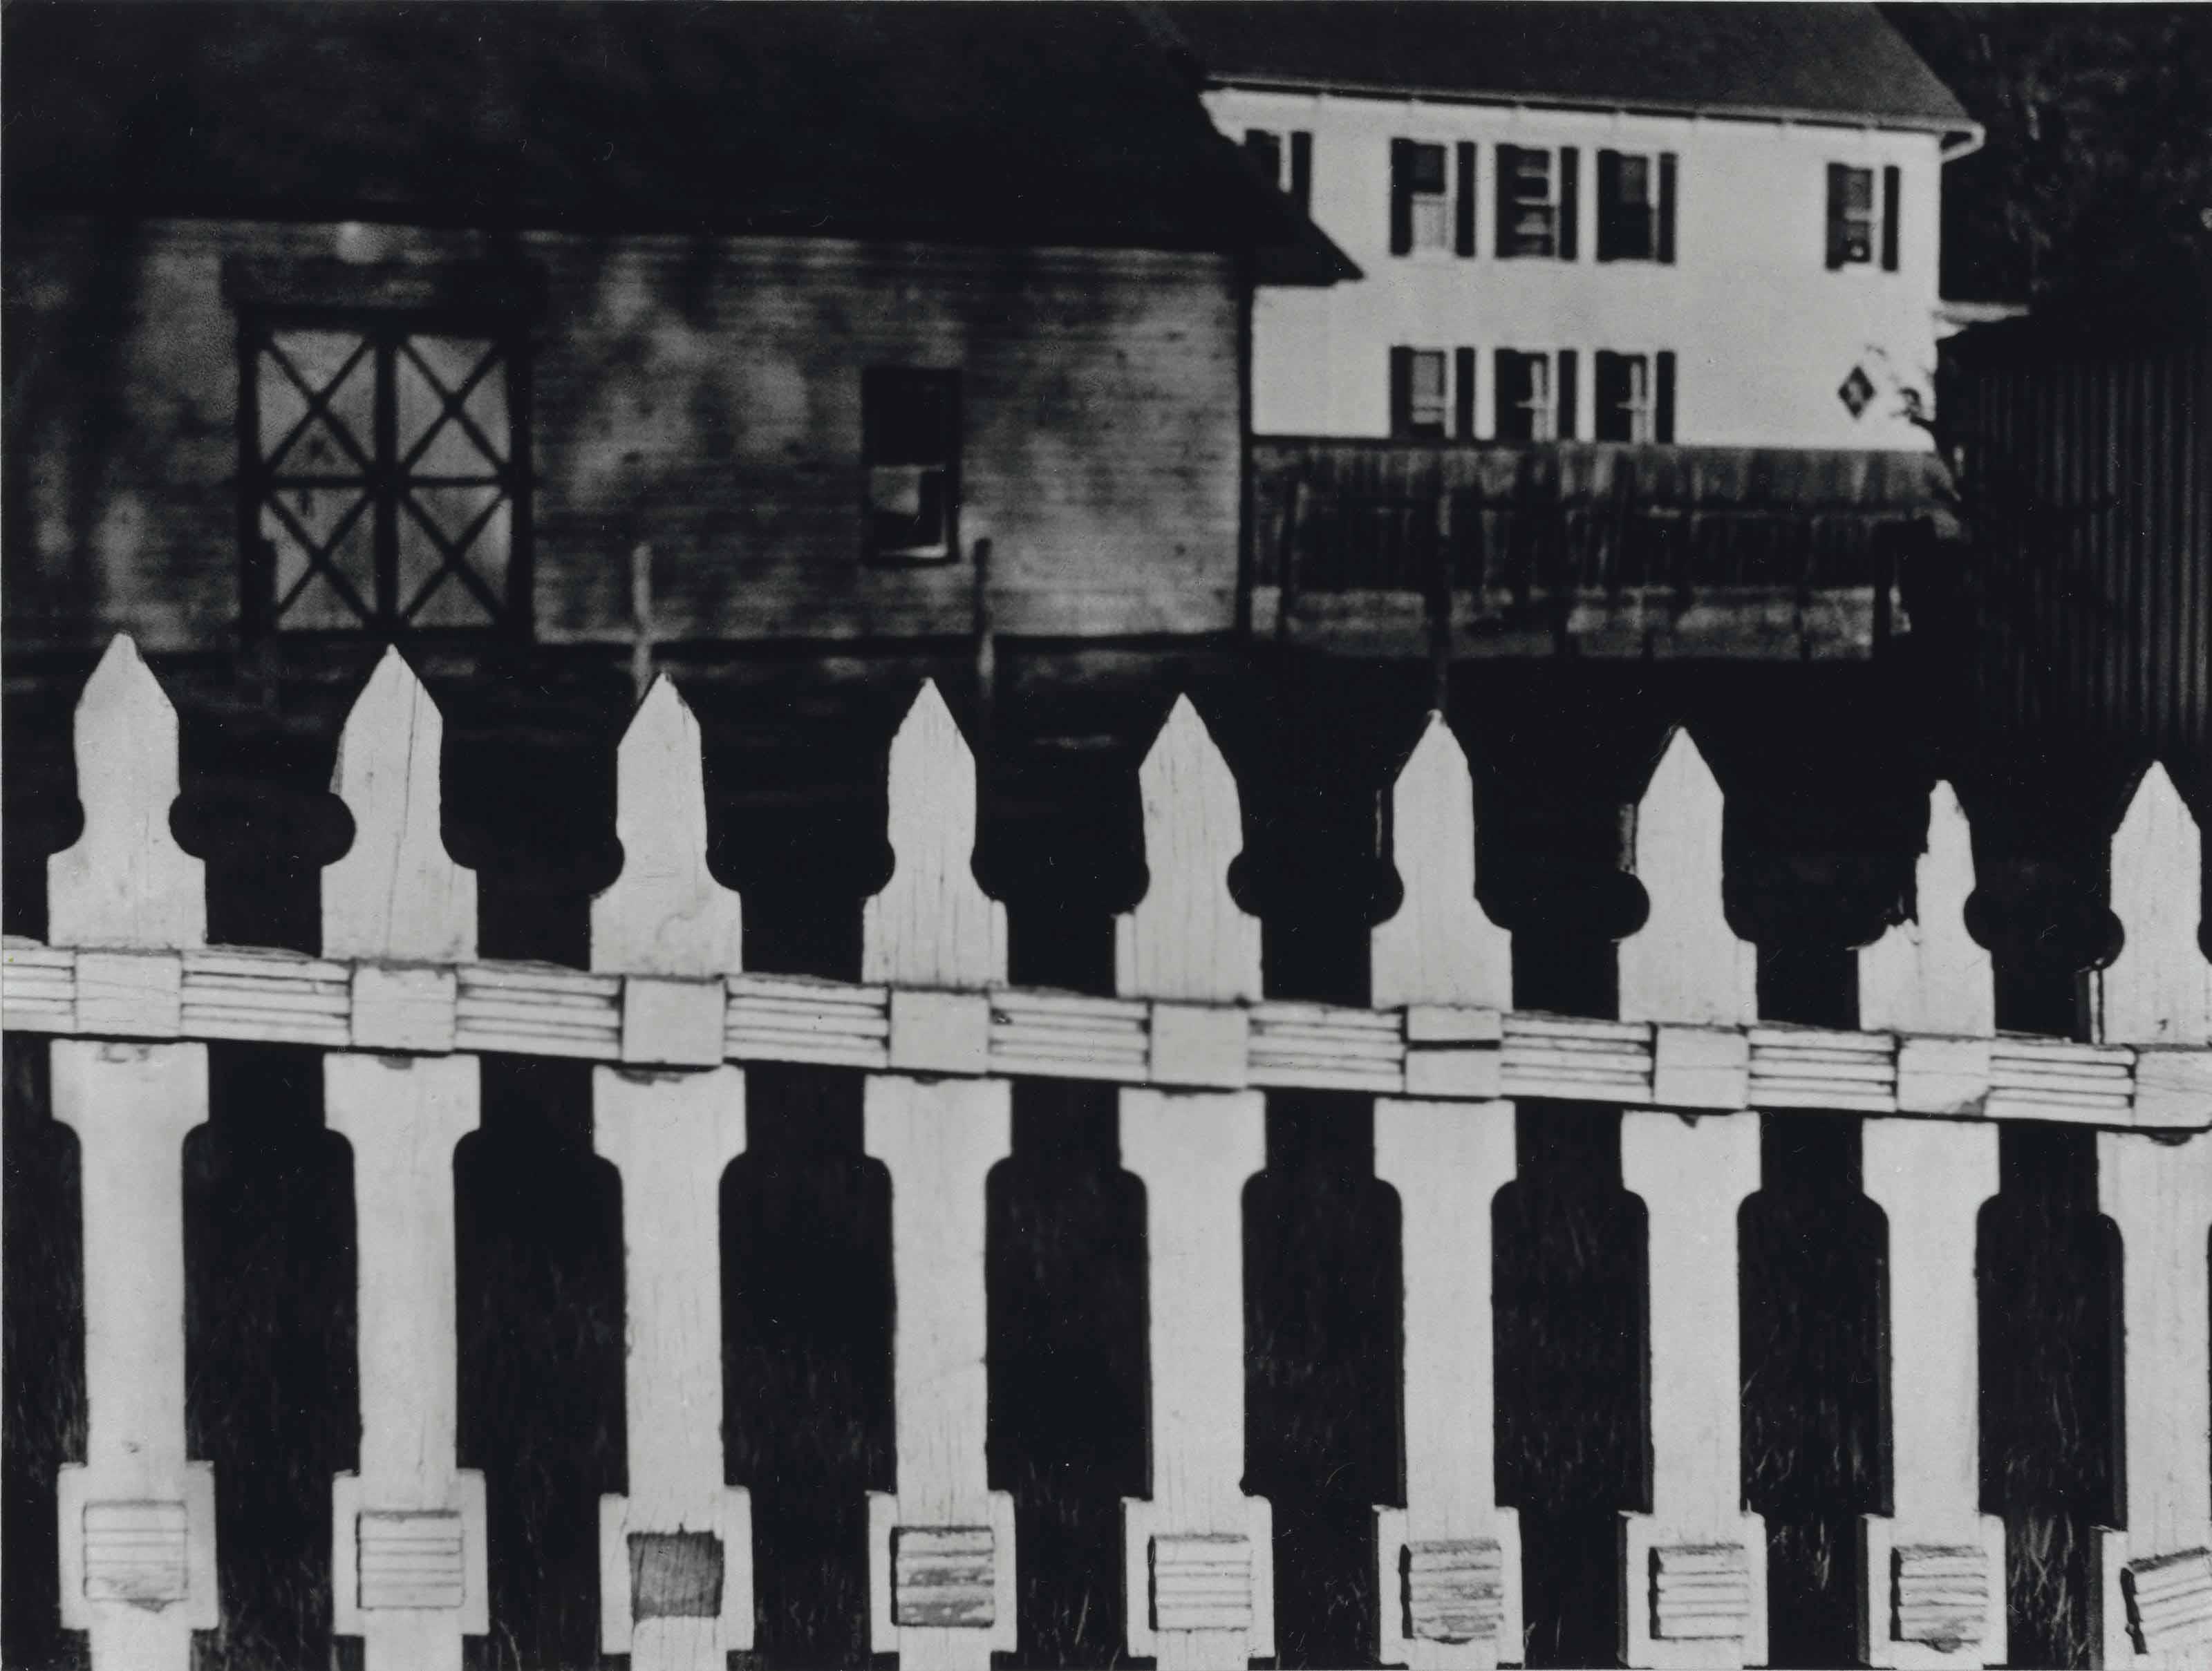 The White Fence, Port Kent, New York, 1916